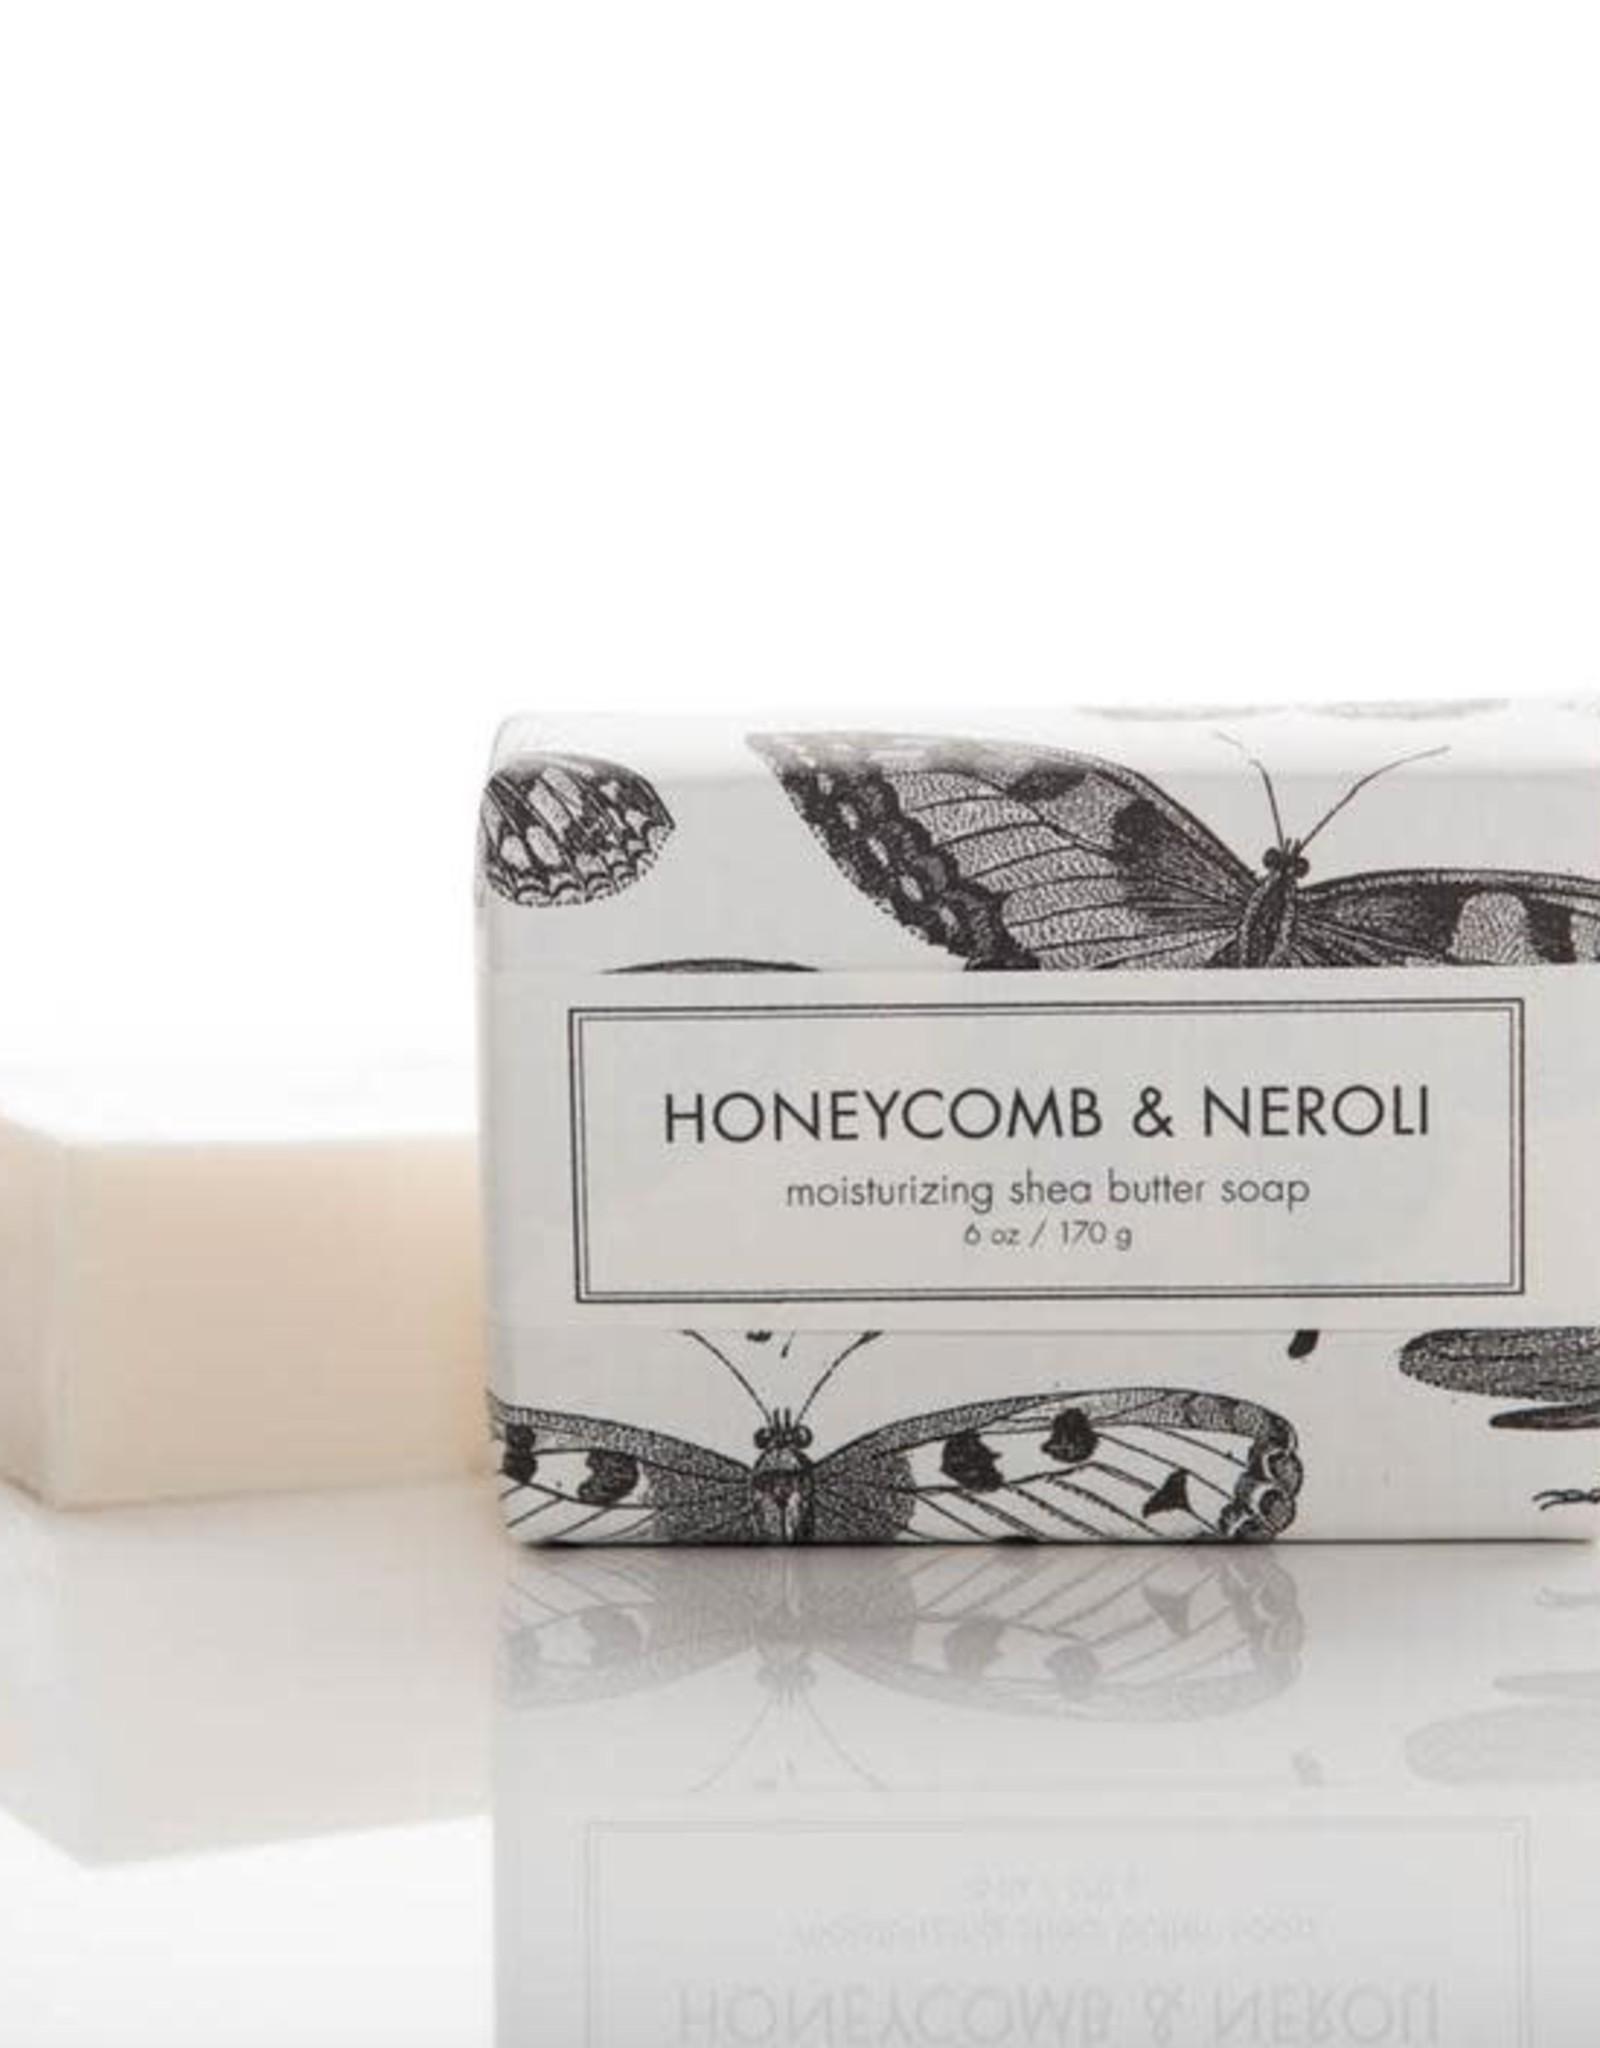 Formulary 55 Honeycomb & Neroli Soap